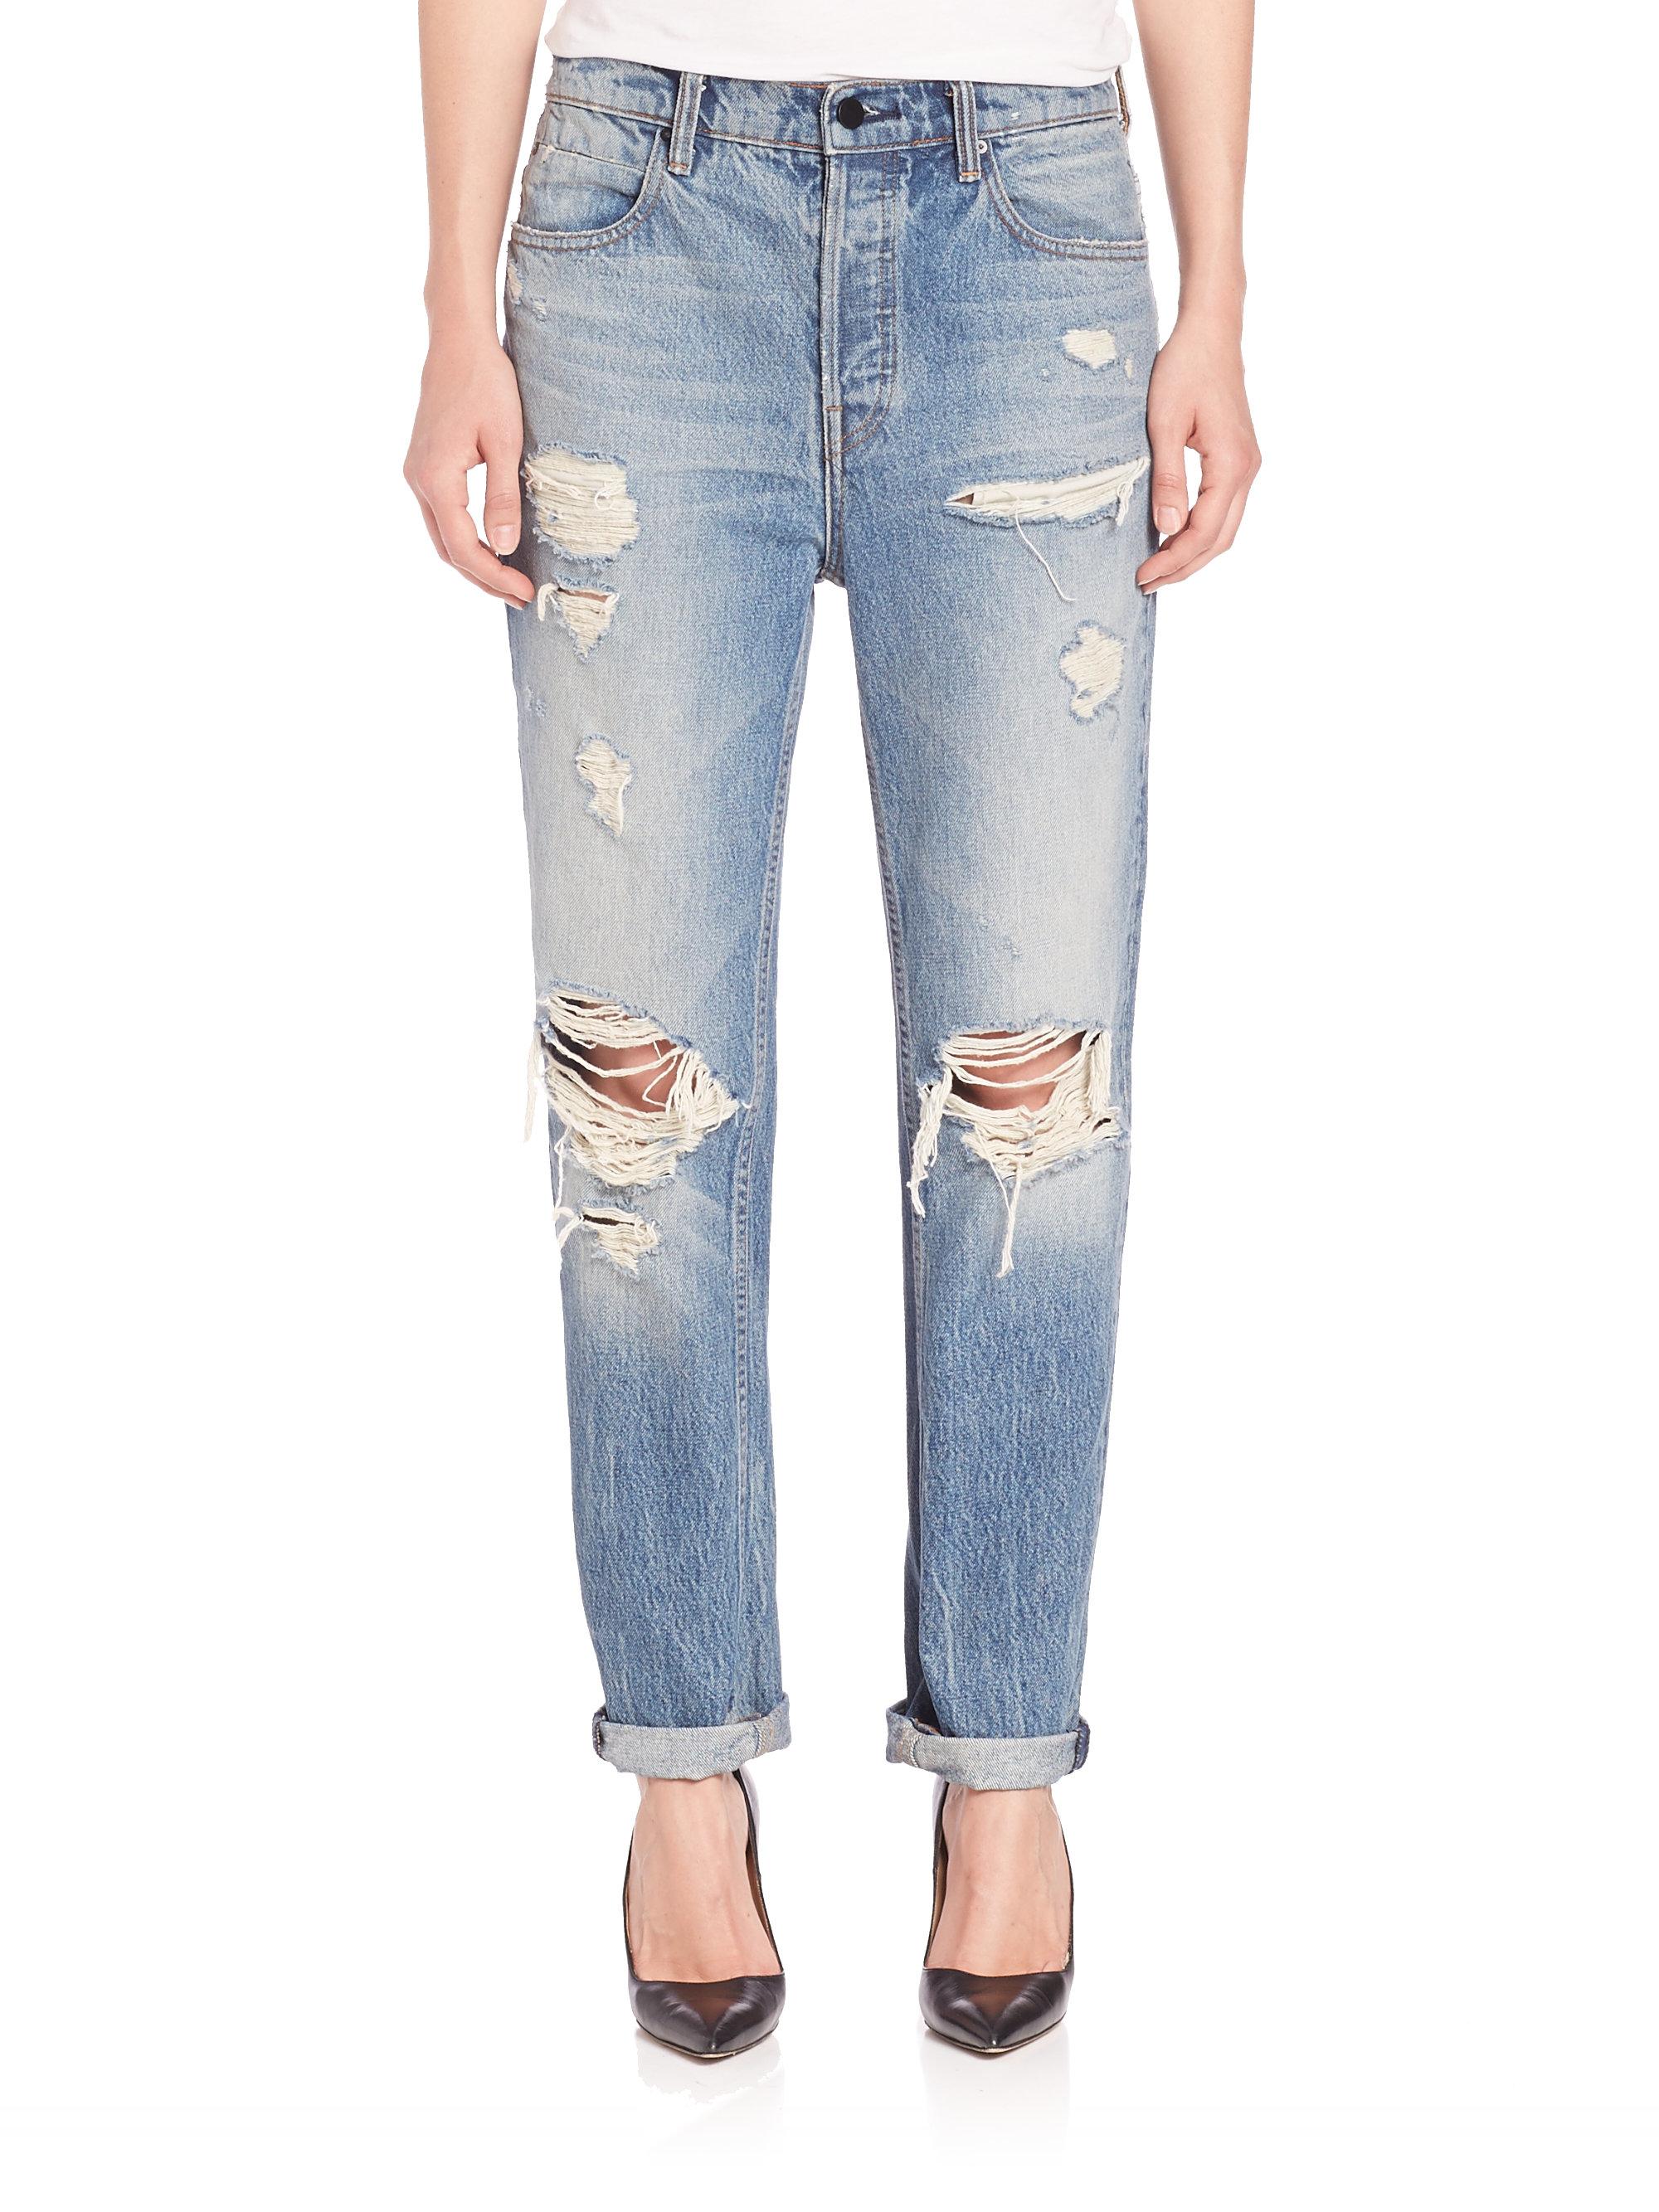 For Sale Sale Online Clearance Online Official Site boyfriend jeans - Blue Alexander Wang Outlet Amazon Official Sale Exclusive W2Wm7tk8